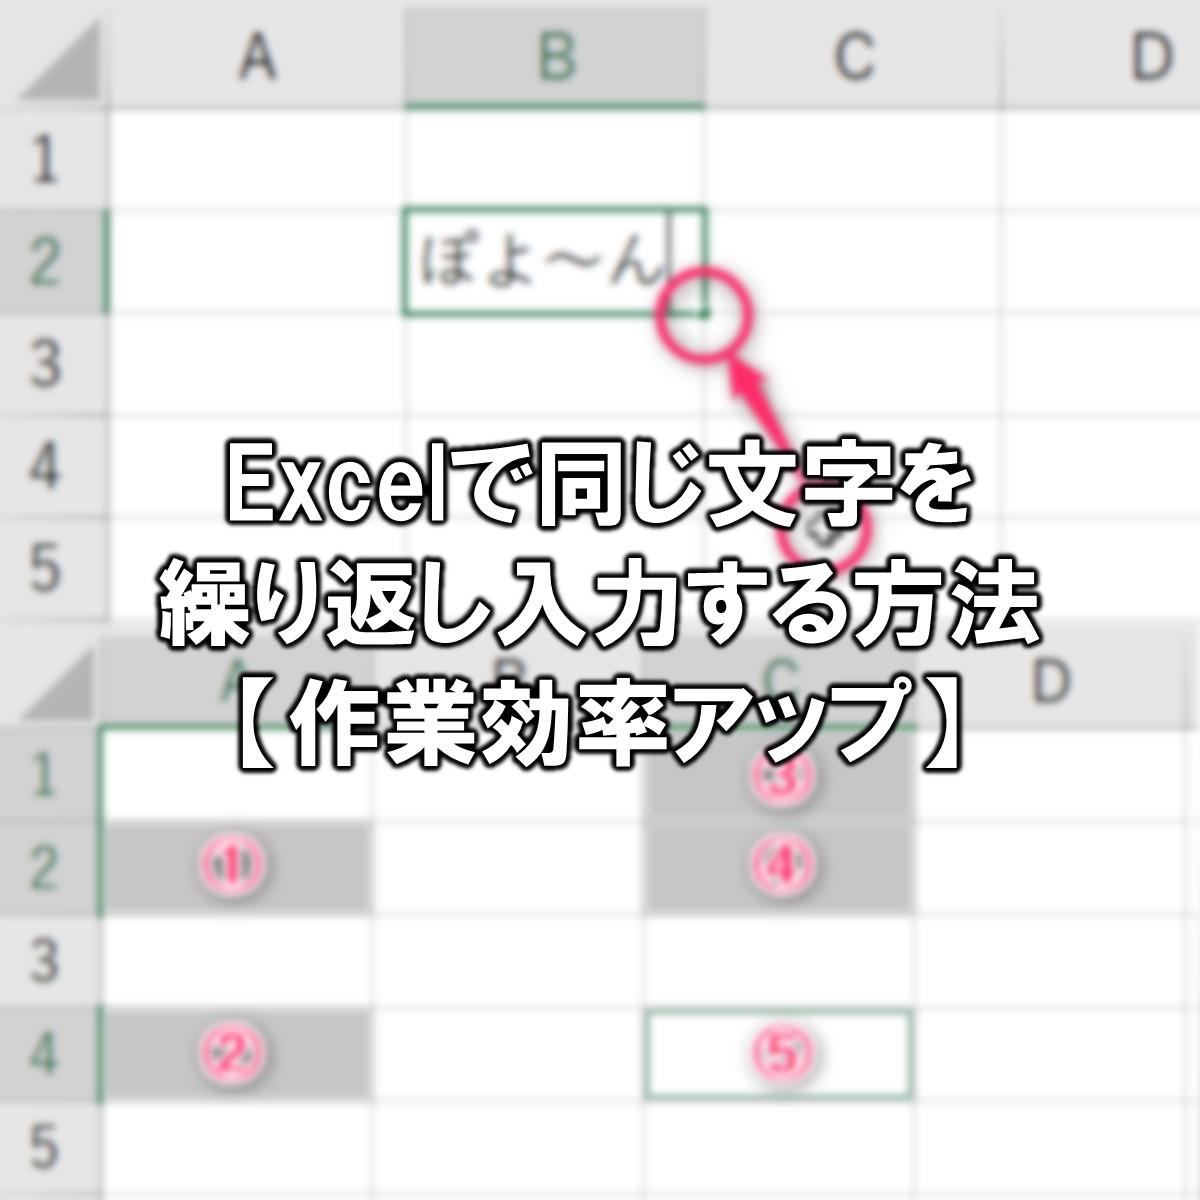 Excelで同じ文字を繰り返し入力する方法